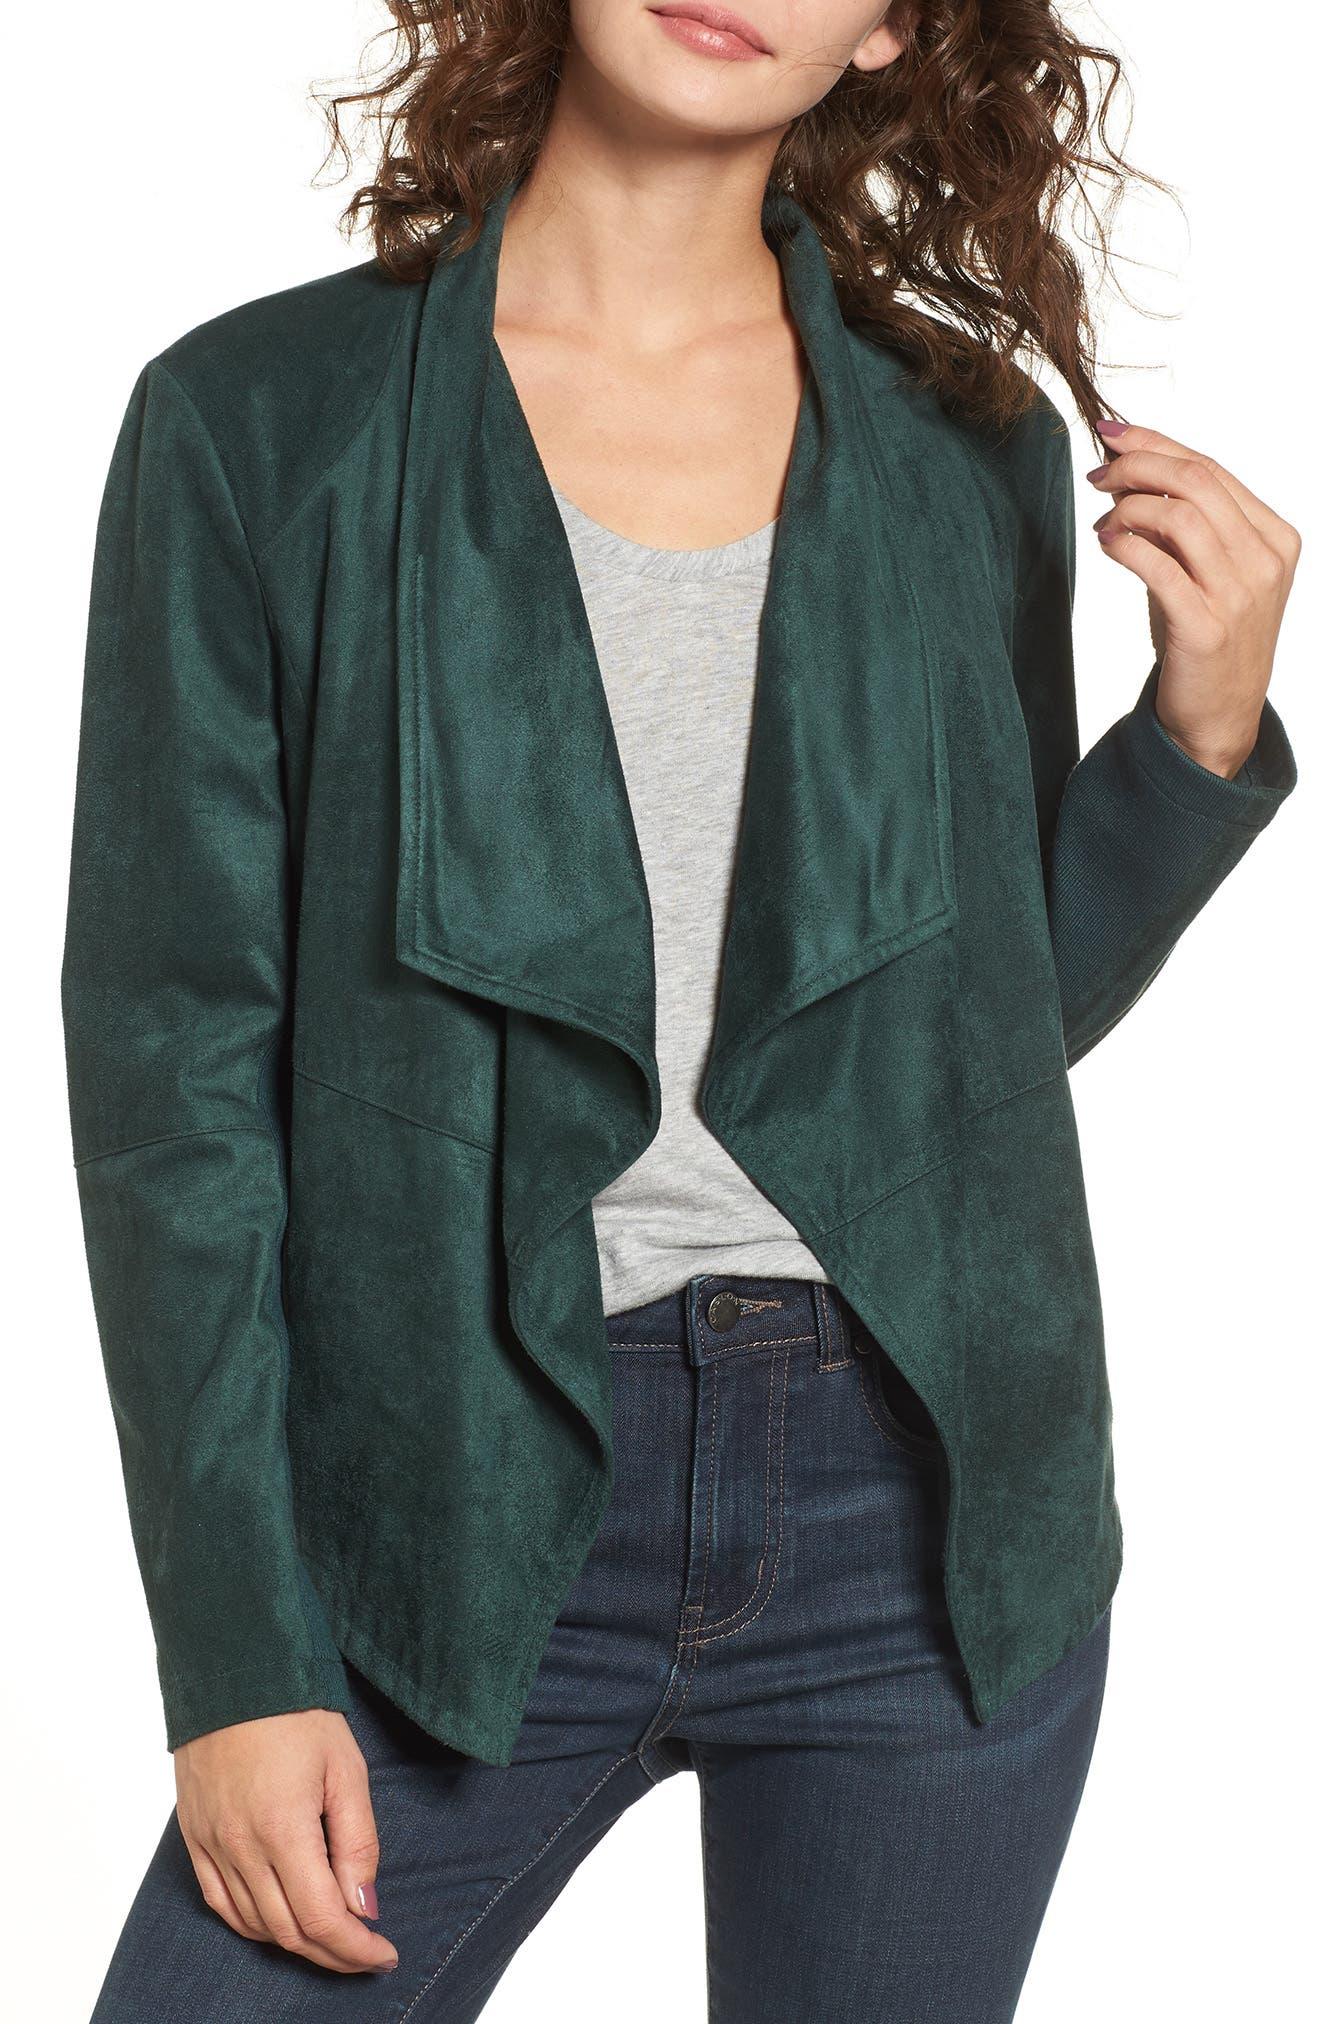 BB Dakota 'Nicholson' Faux Suede Drape Front Jacket